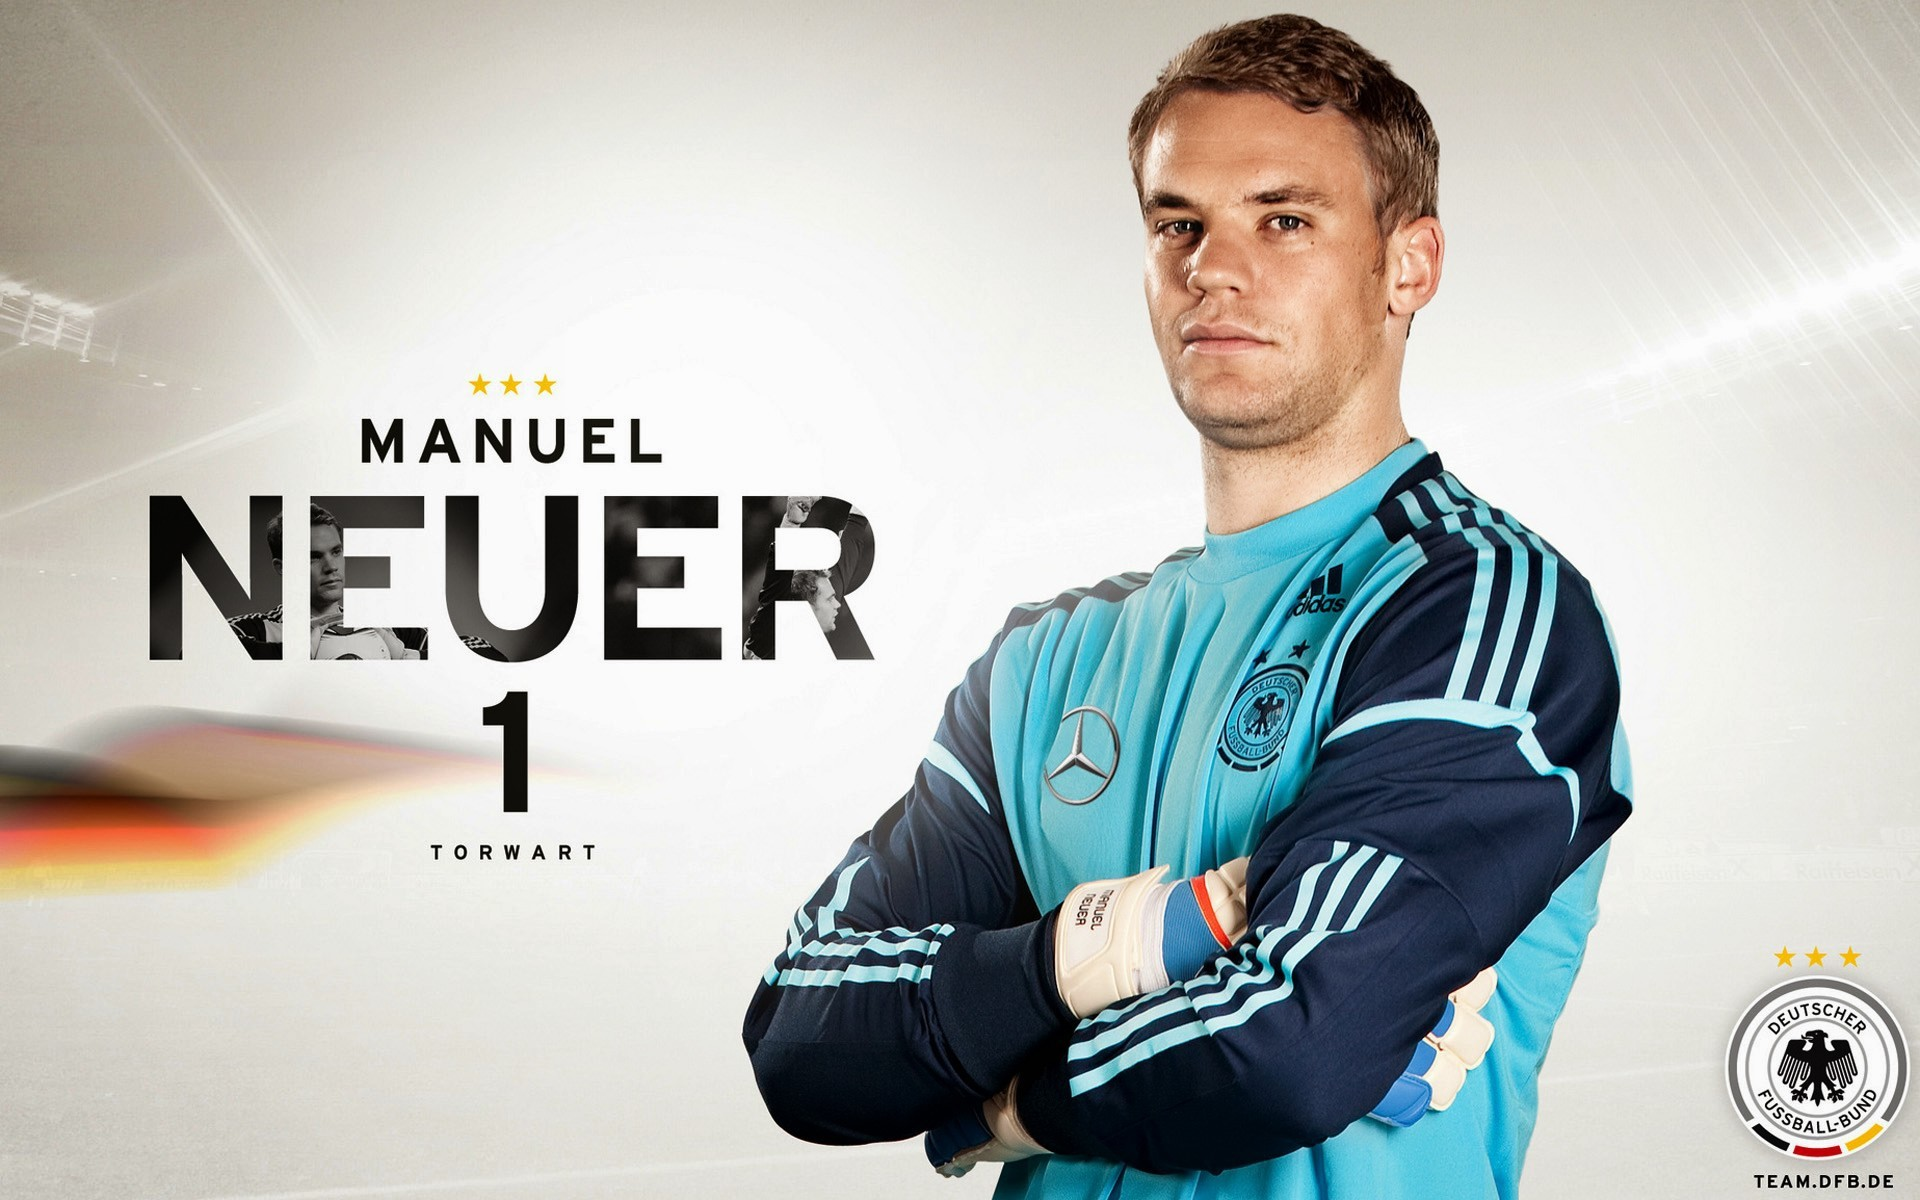 Manuel Neuer Laptop Wallpapers